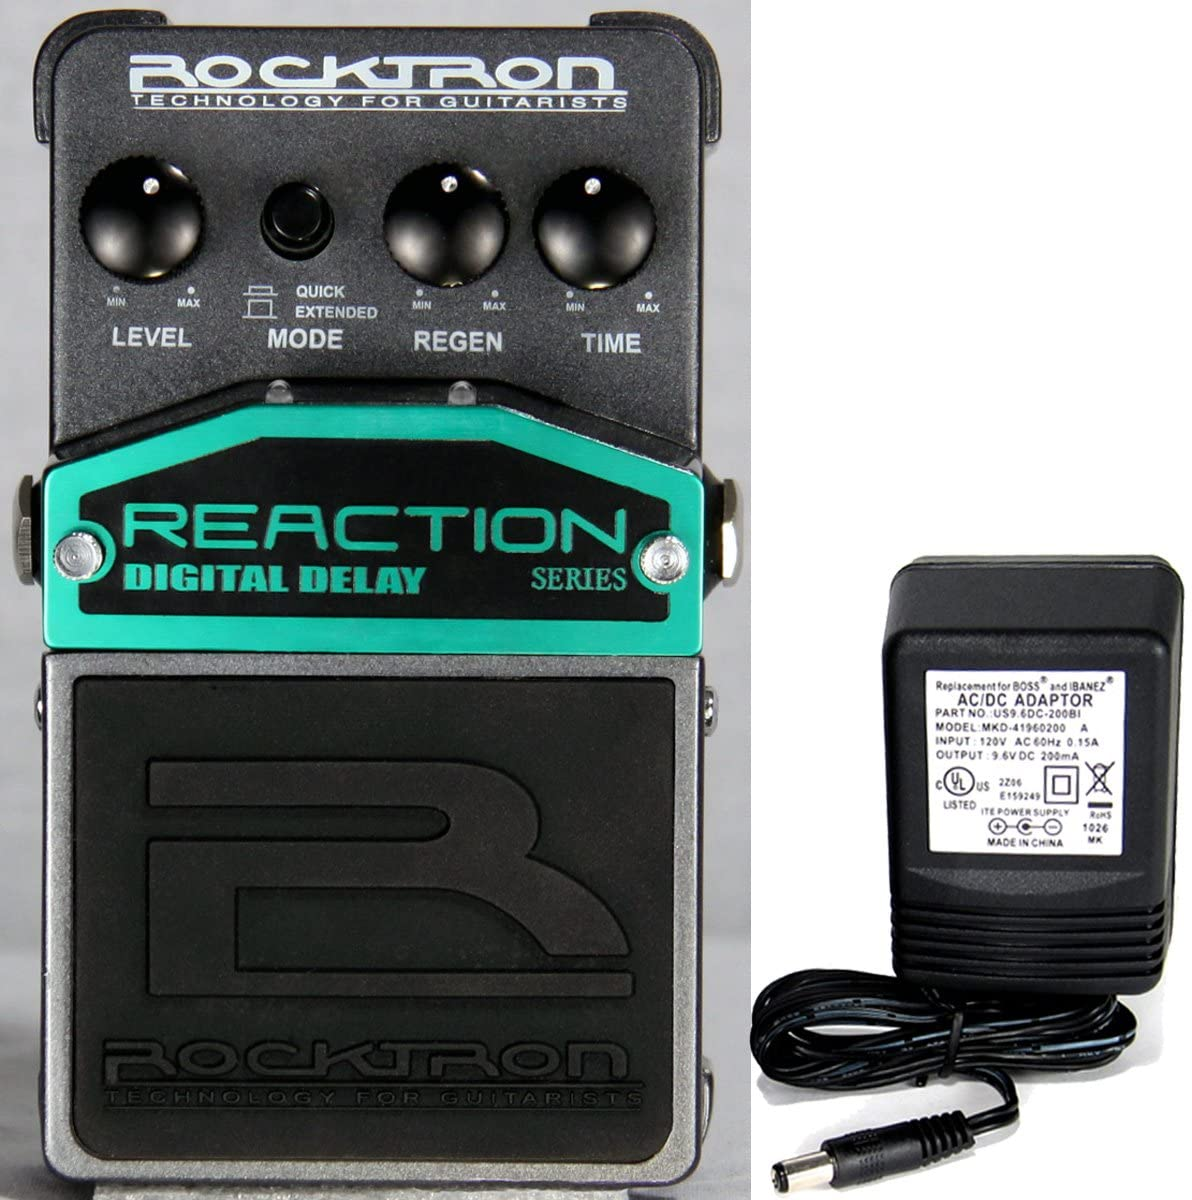 Rocktron Reaction Digital Delay Effect Pedal